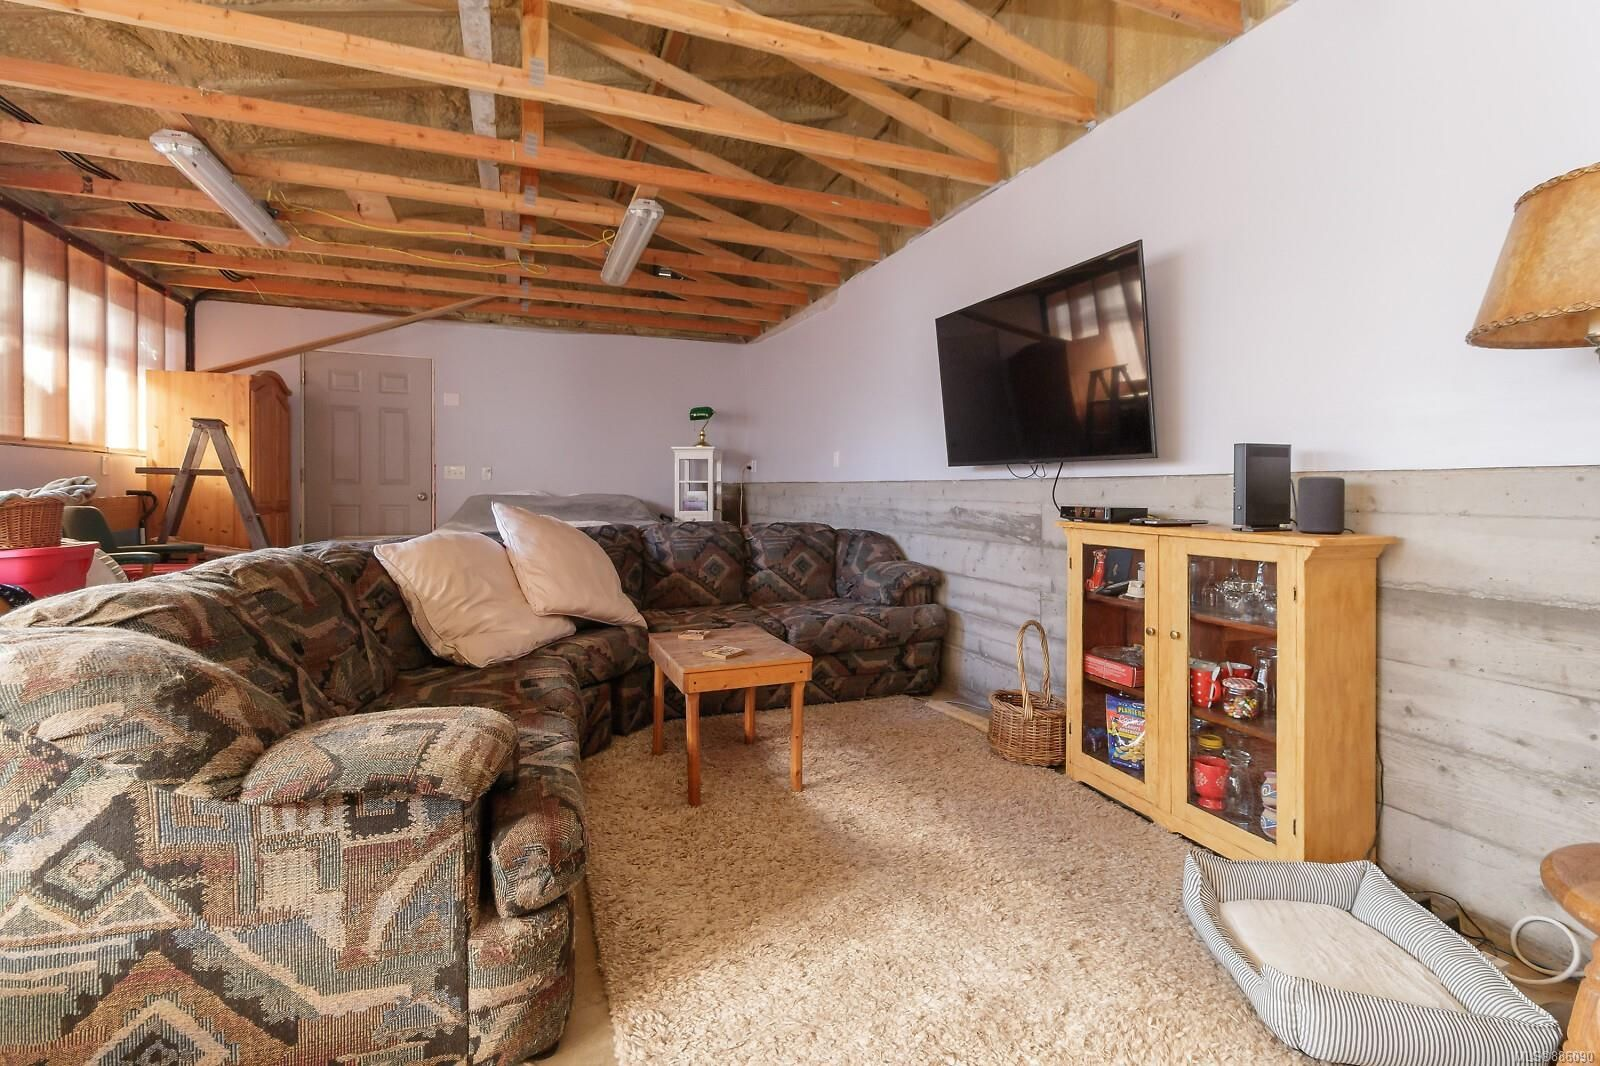 Photo 24: Photos: 4553 Blenkinsop Rd in : SE Blenkinsop House for sale (Saanich East)  : MLS®# 886090